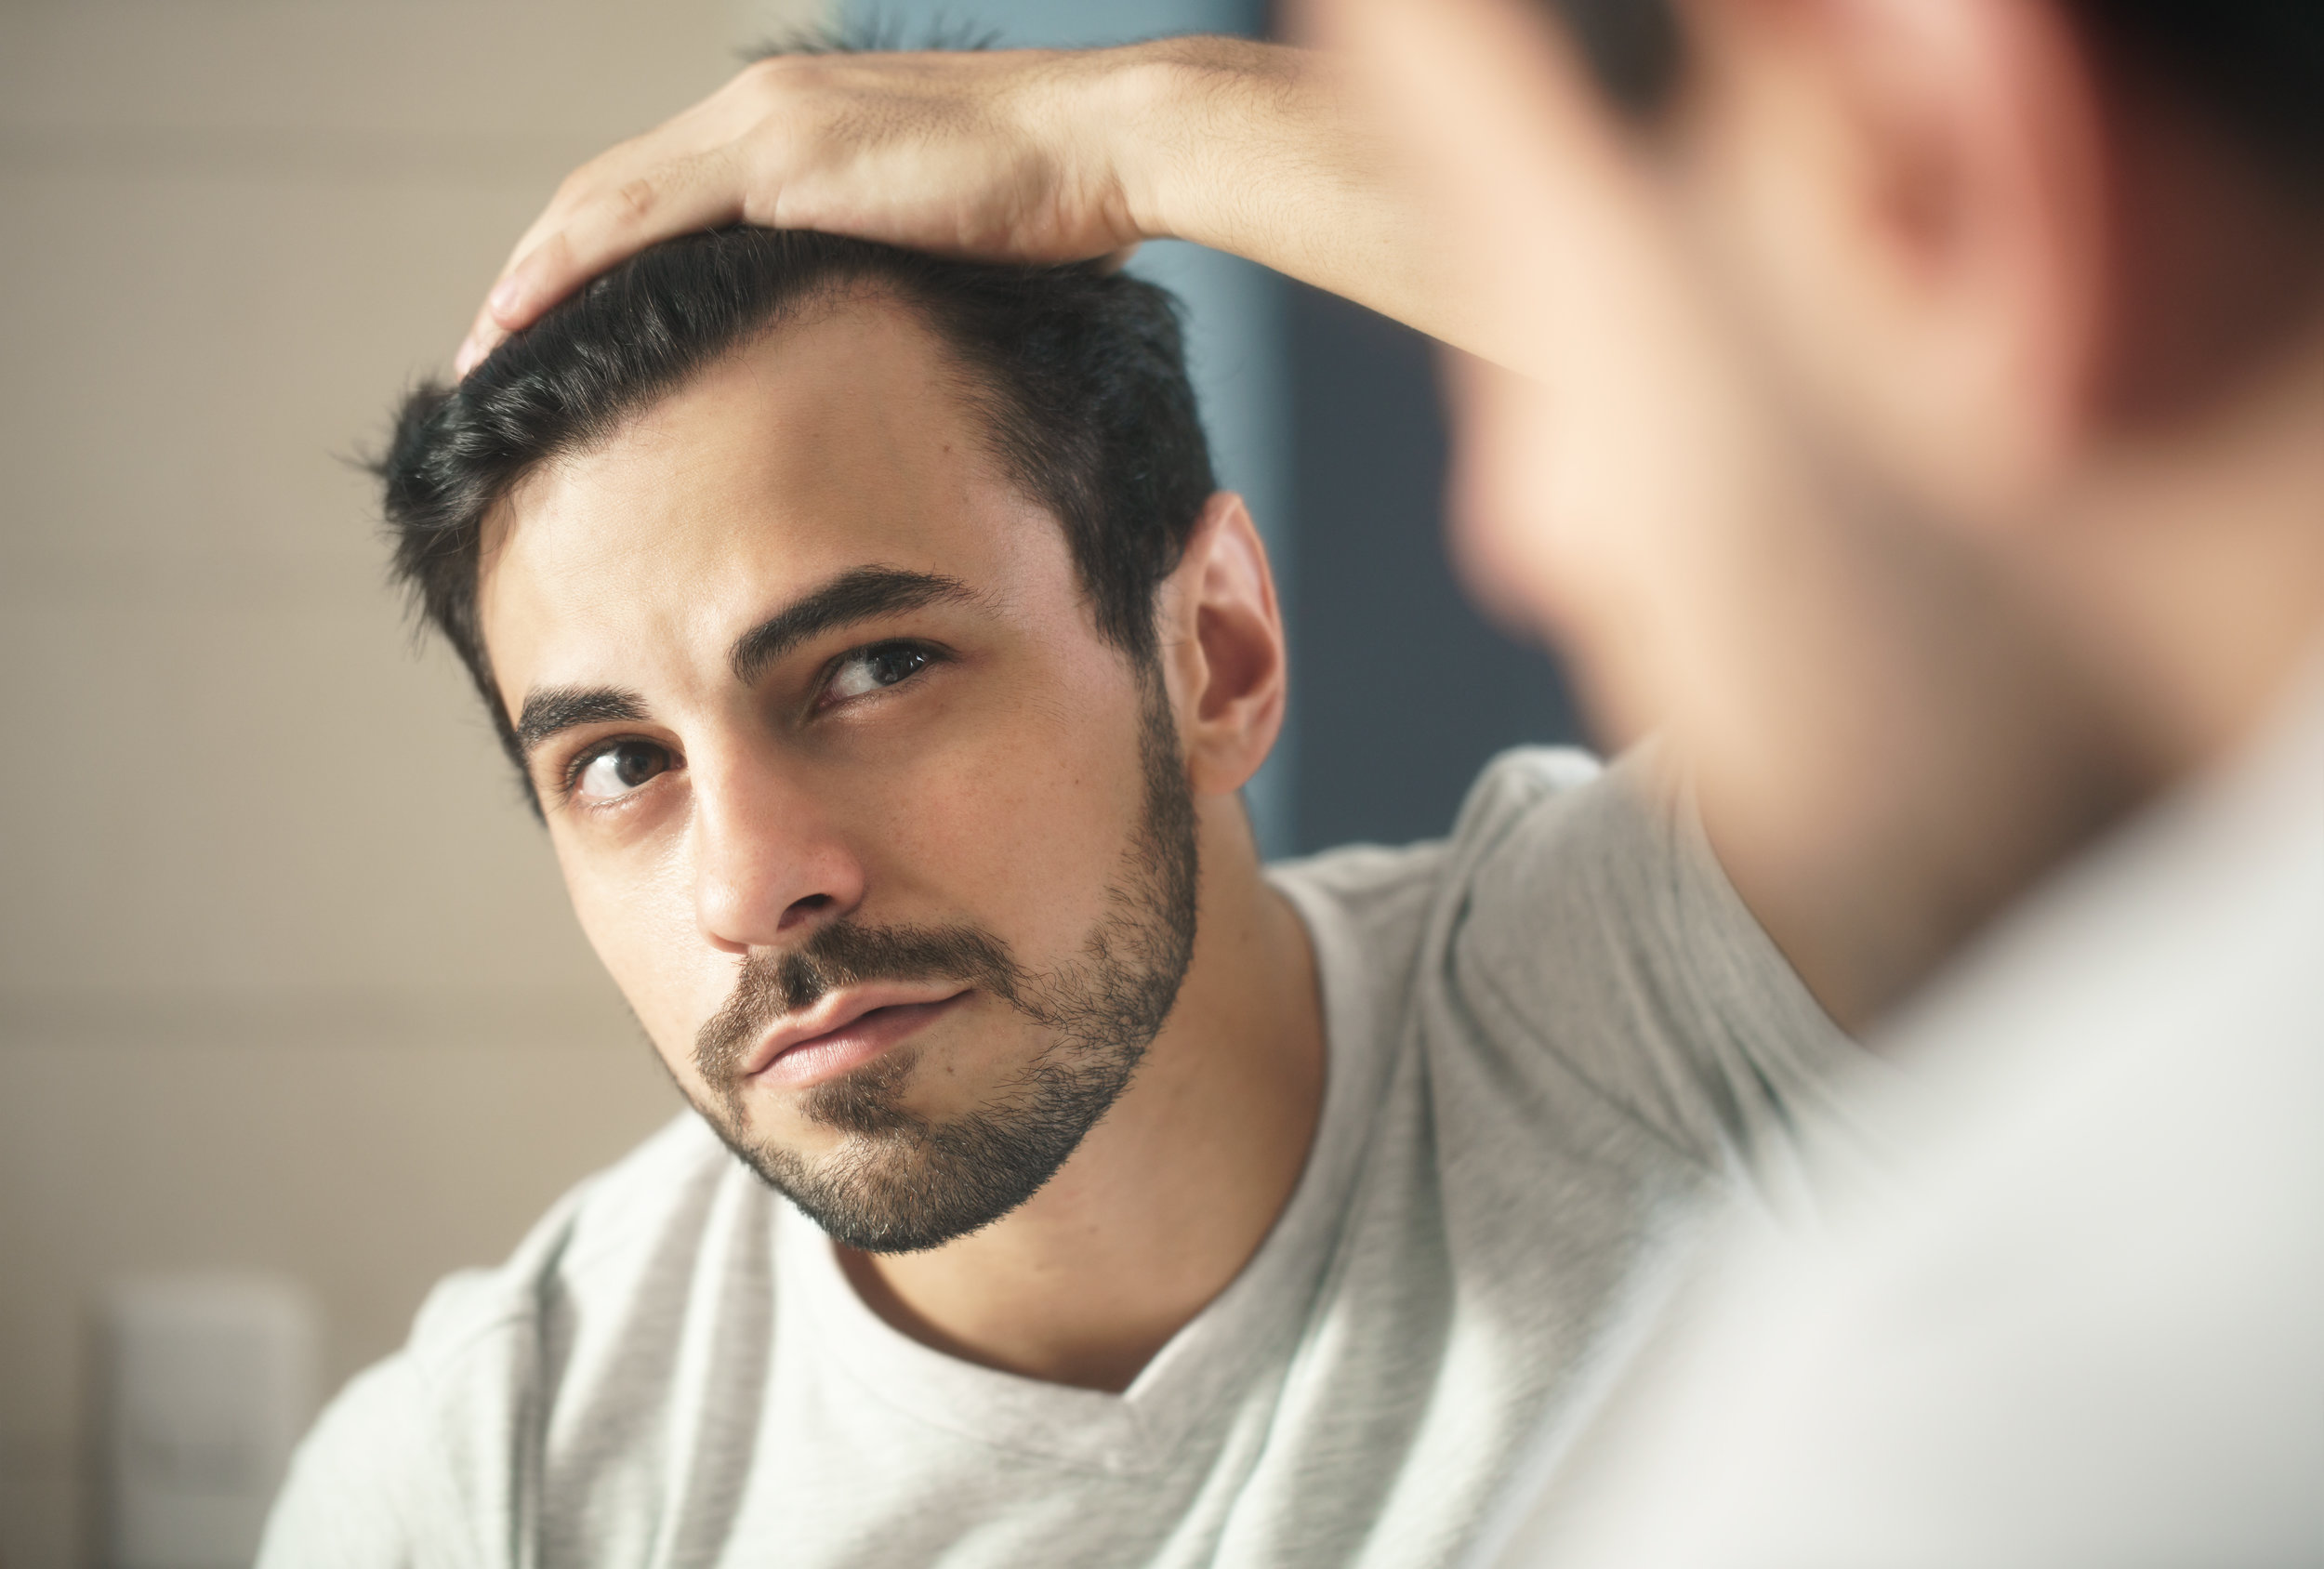 man-worried-for-alopecia-checking-hair-for-loss-324FTZN.jpg